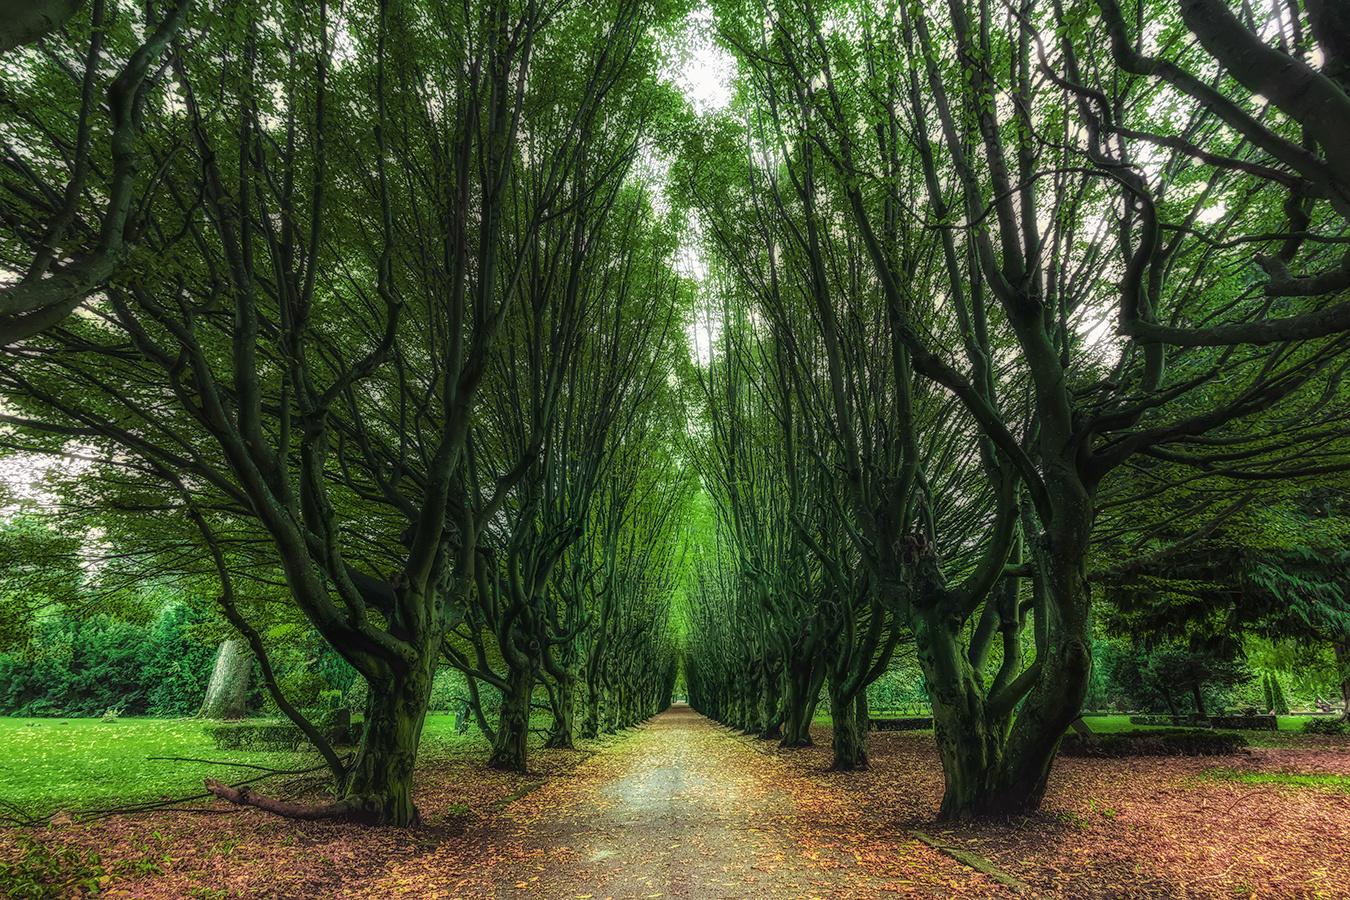 Trees Ally by Hanaa Turkistani